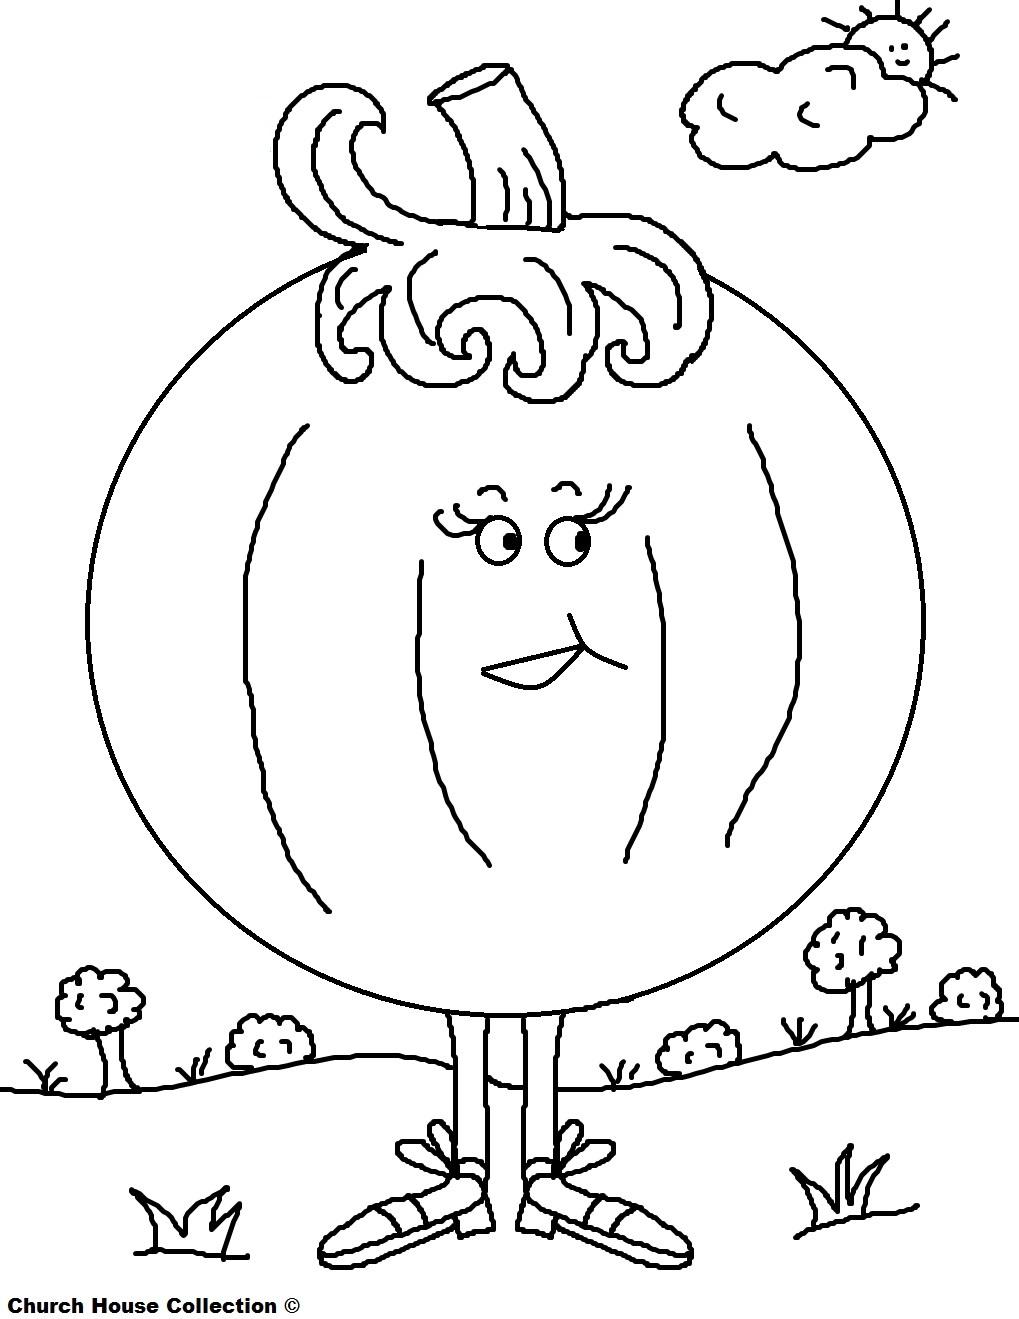 Church House Collection Blog: Free Printable Pumpkin